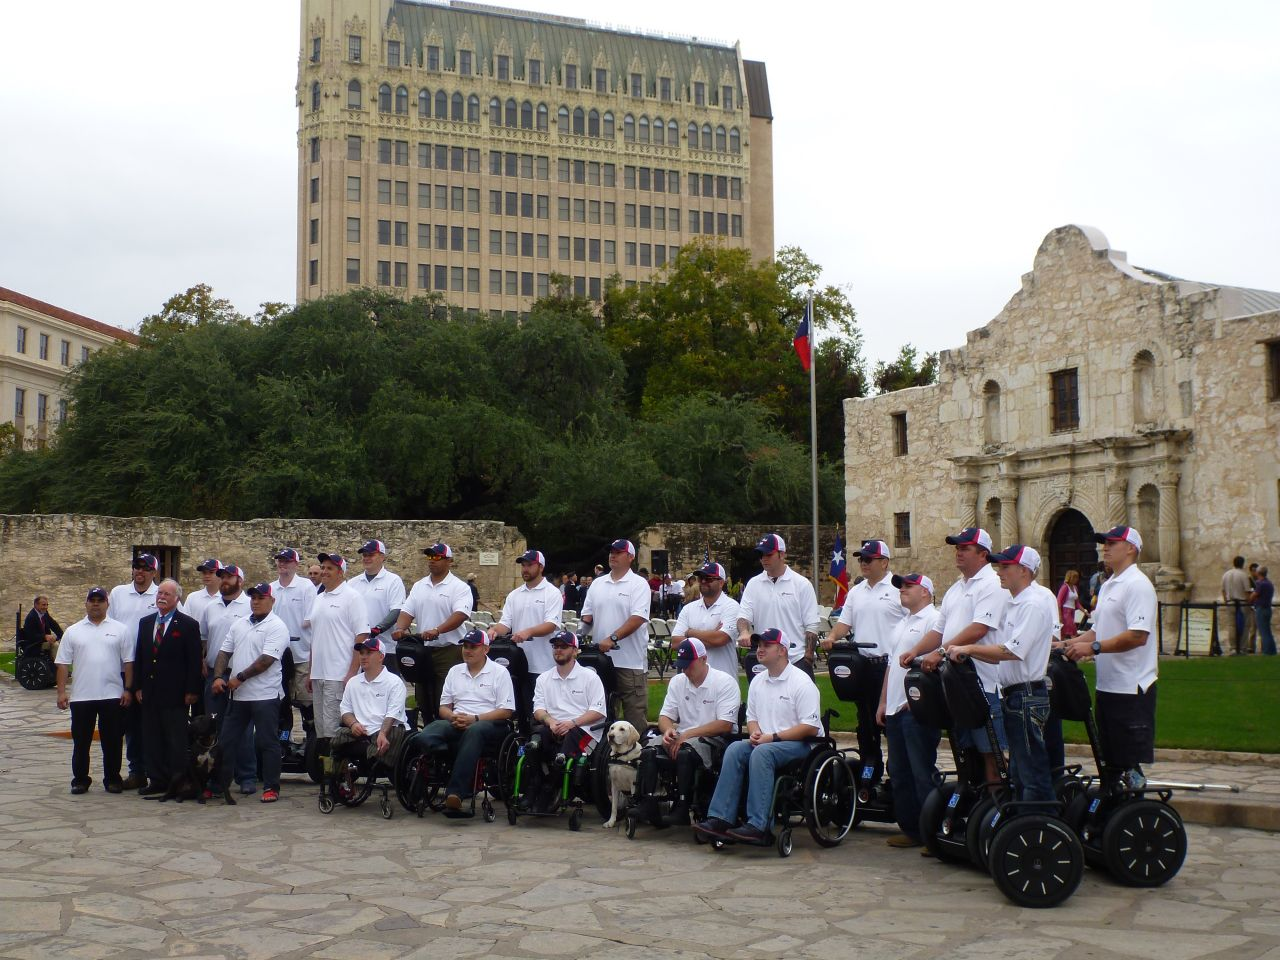 Segs4Vets.org At The Alamo, San Antonio, TX